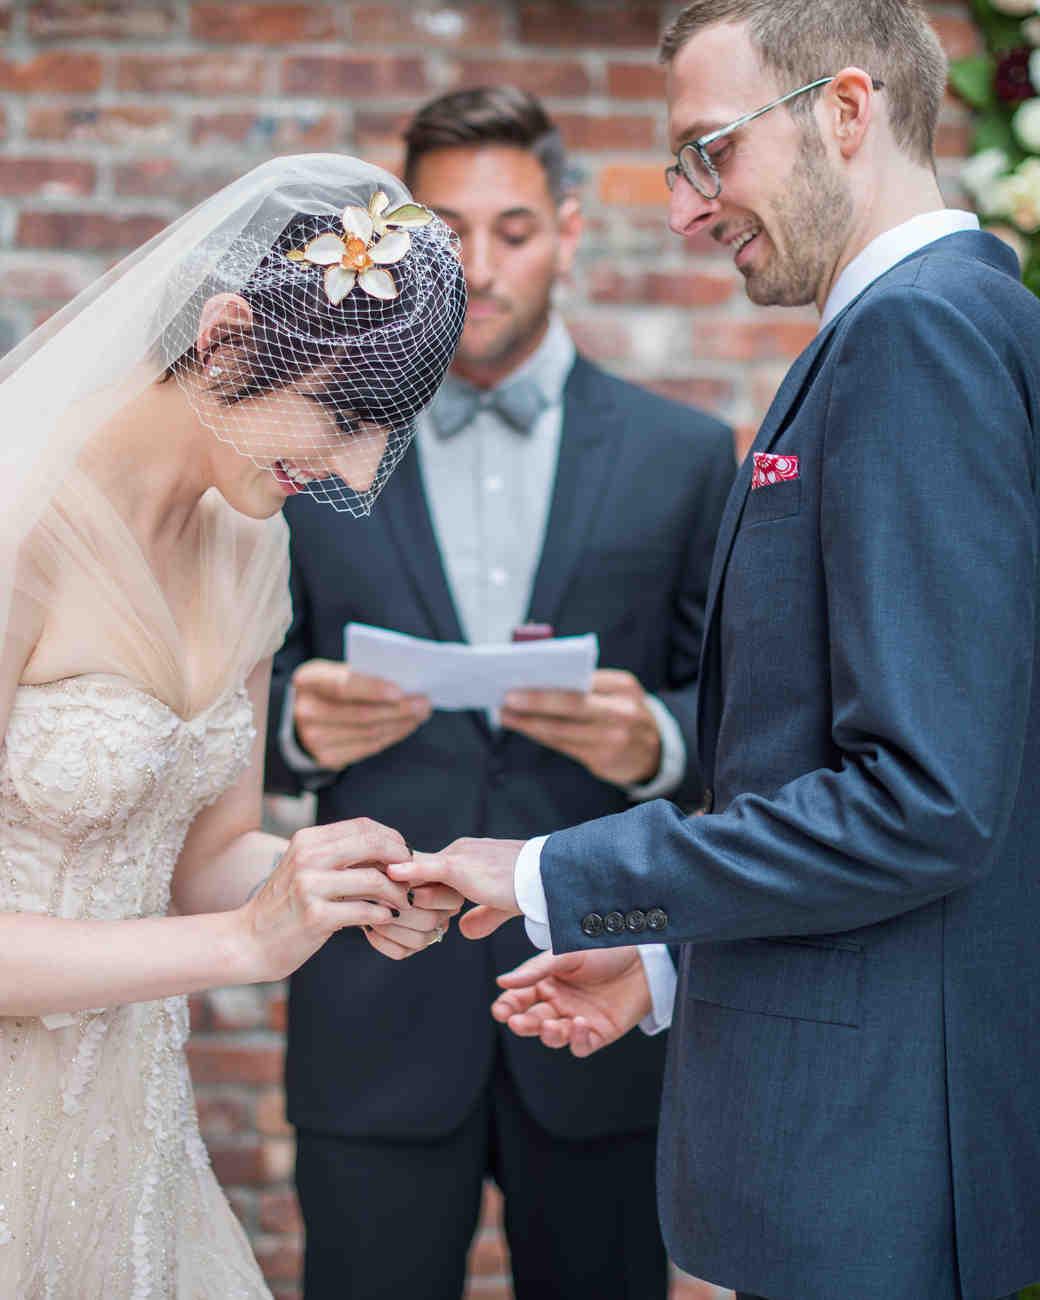 caitlin-michael-wedding-ceremony-350-s111835-0415.jpg